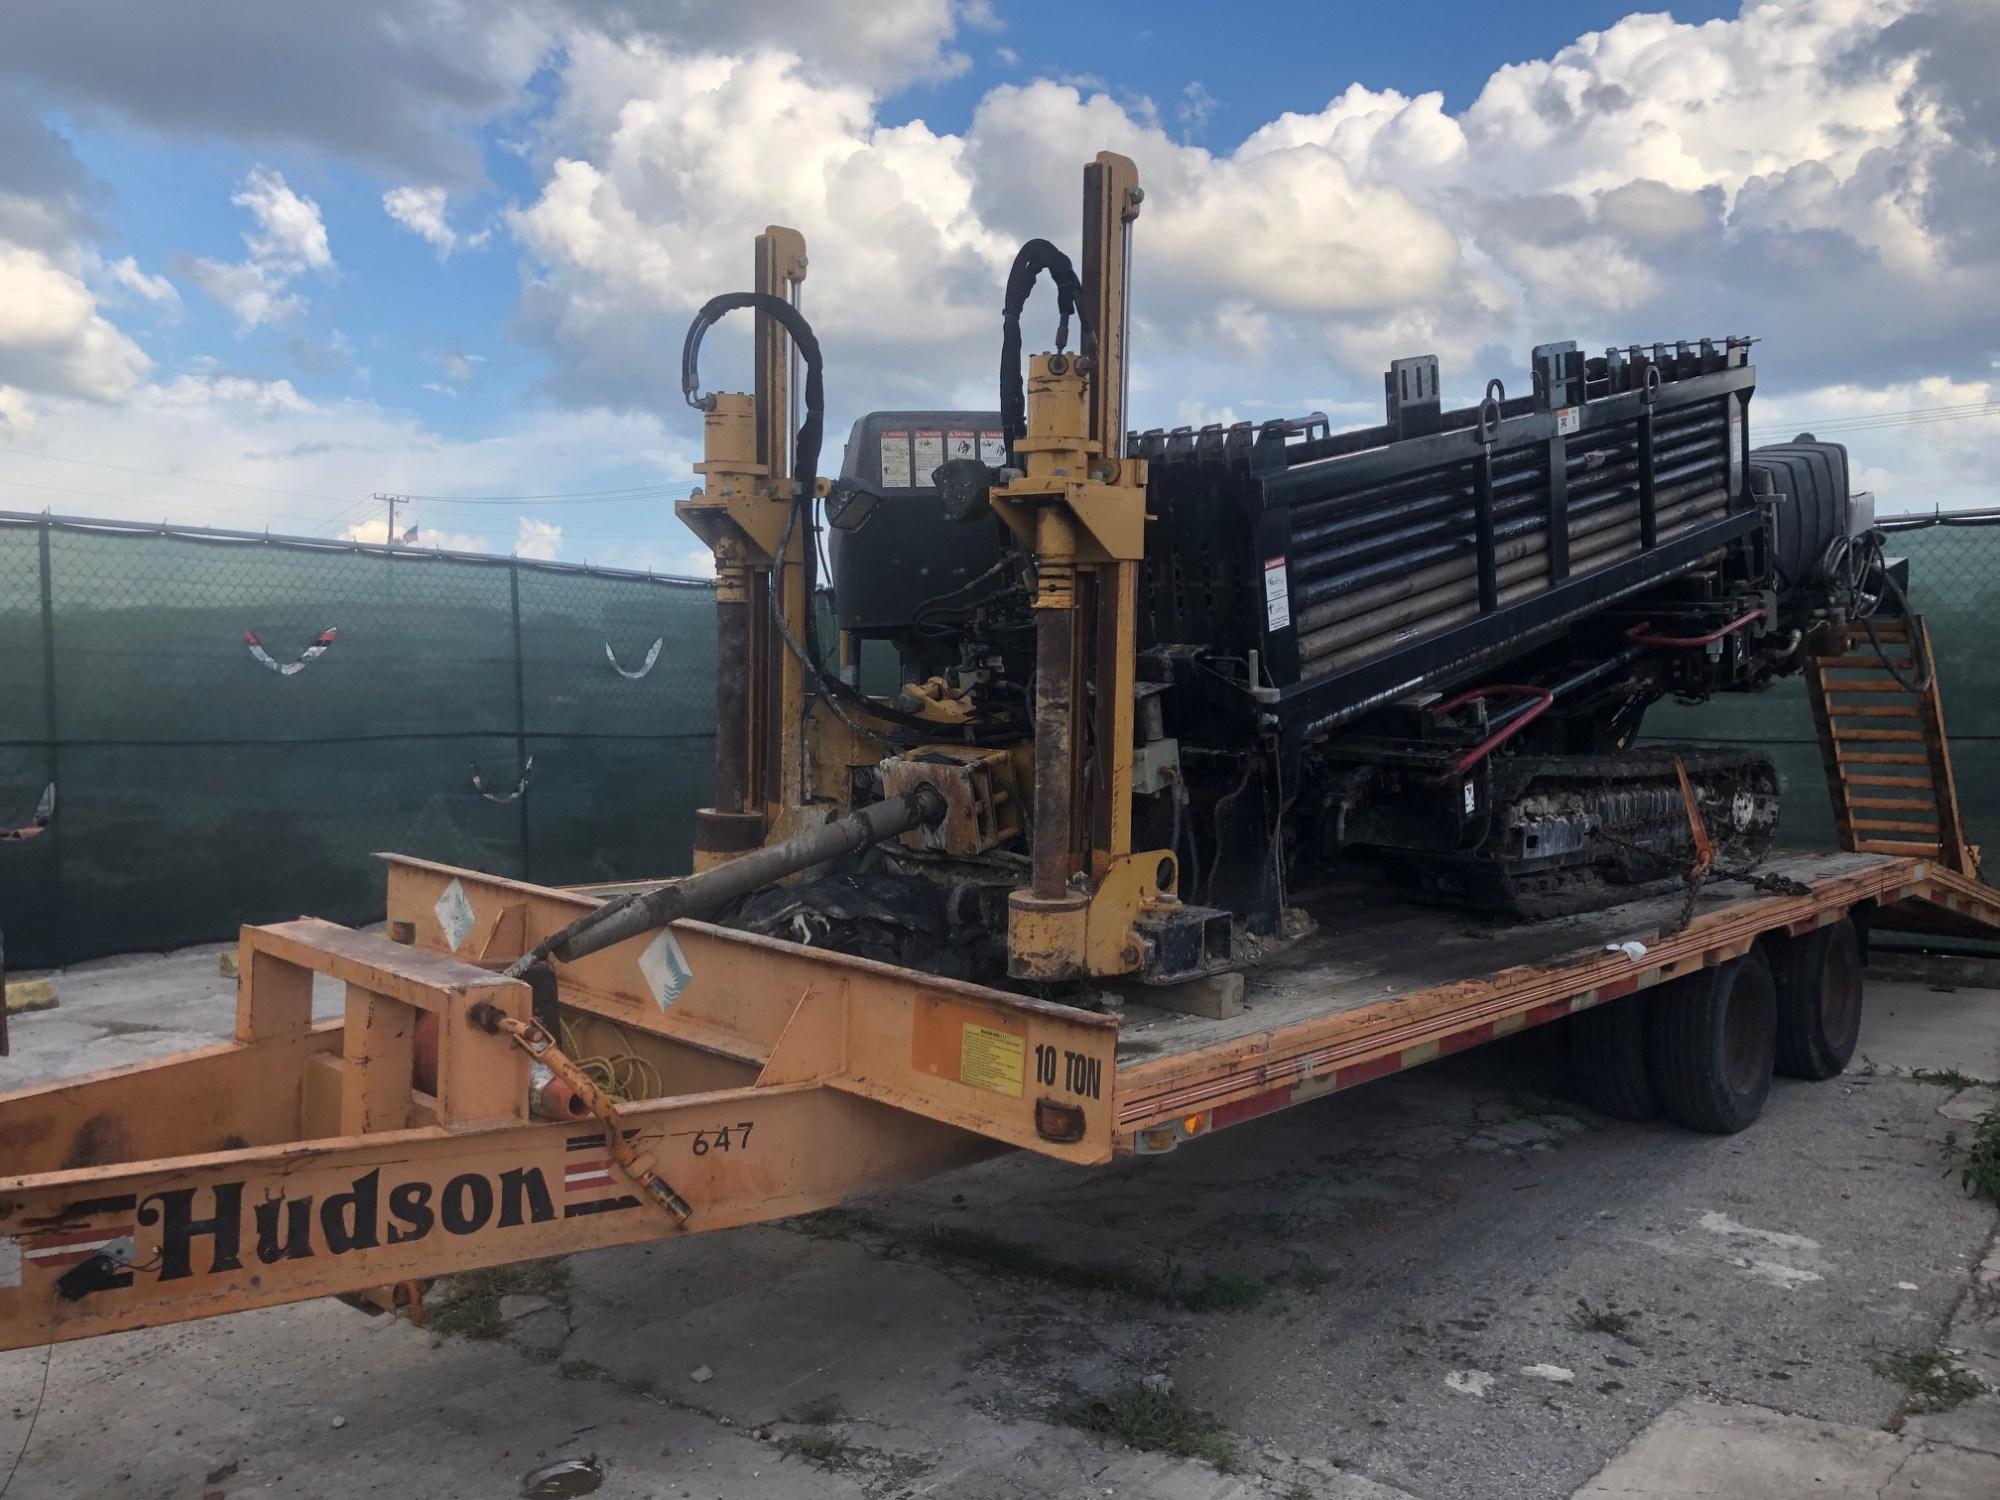 hight resolution of hudson dual axle wheel 10 ton equipment deck over trailer